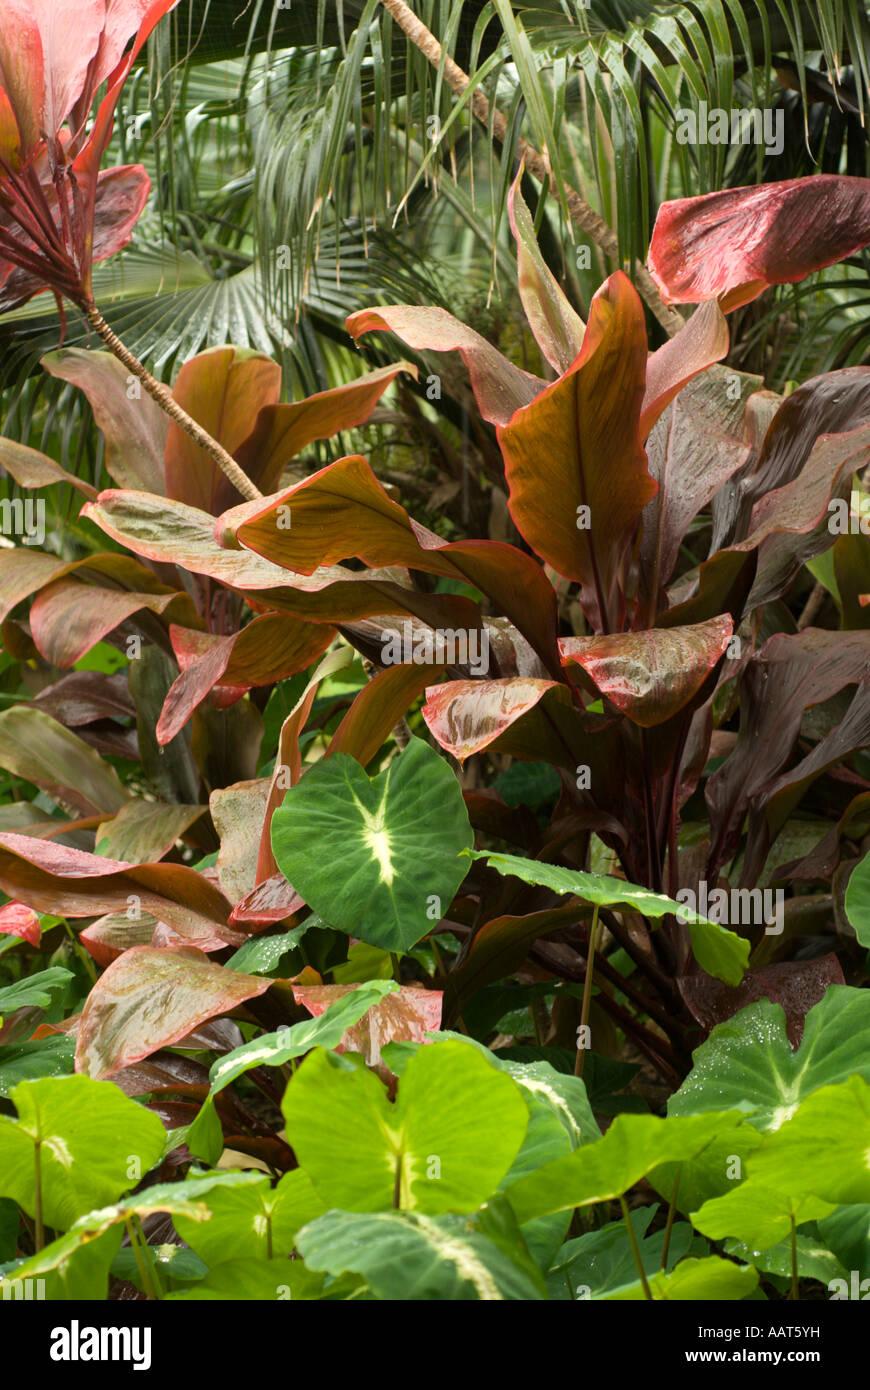 Hoomaluhia Botanical Garden Stock Photos & Hoomaluhia Botanical ...